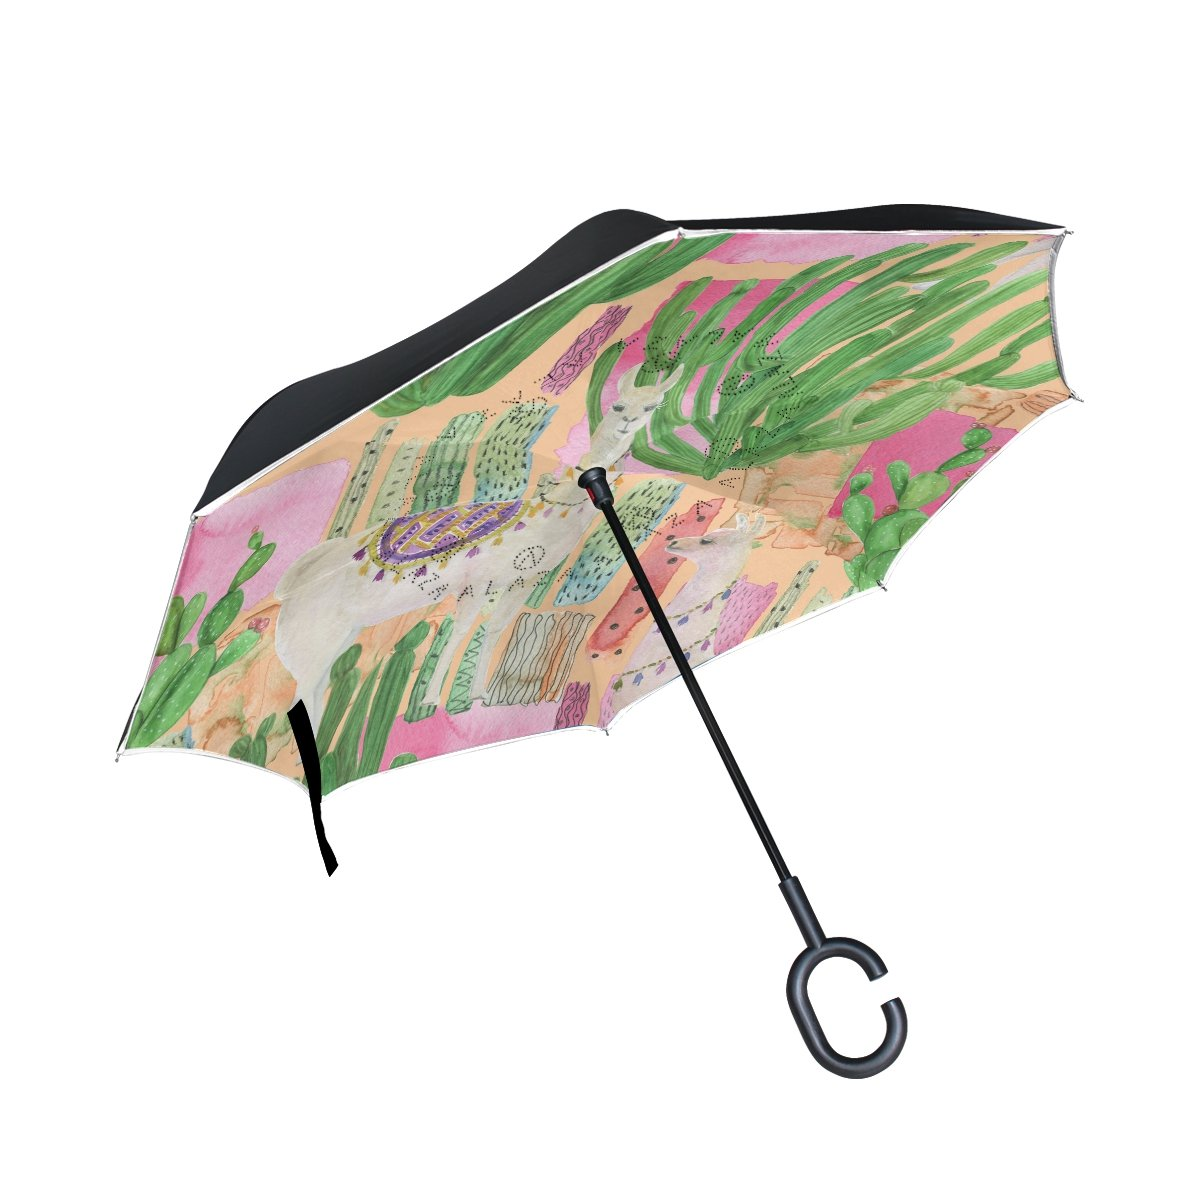 Alaza Inverted傘水彩画Tropical LlamasサボテンUVアンチ防水防風Reverse Folding Umbrellas With c-shapeハンドル車屋外の旅行   B077S2N2HF